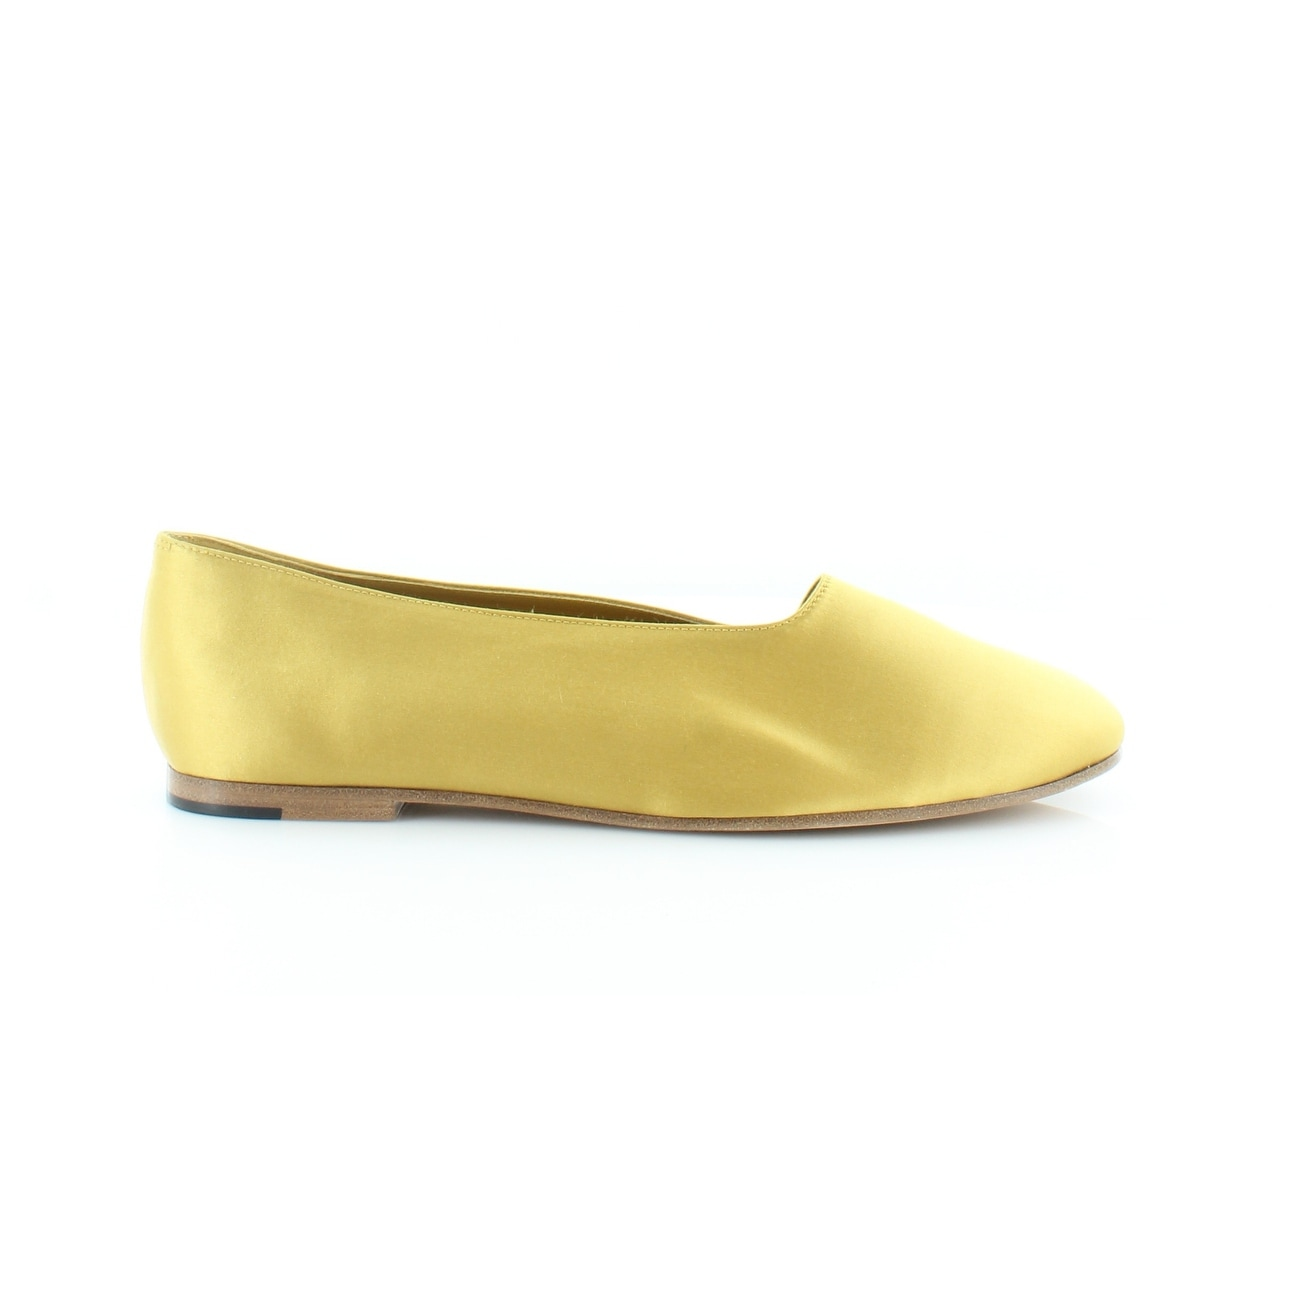 12914e6b3 Buy Vince Women's Flats Online at Overstock | Our Best Women's Shoes Deals